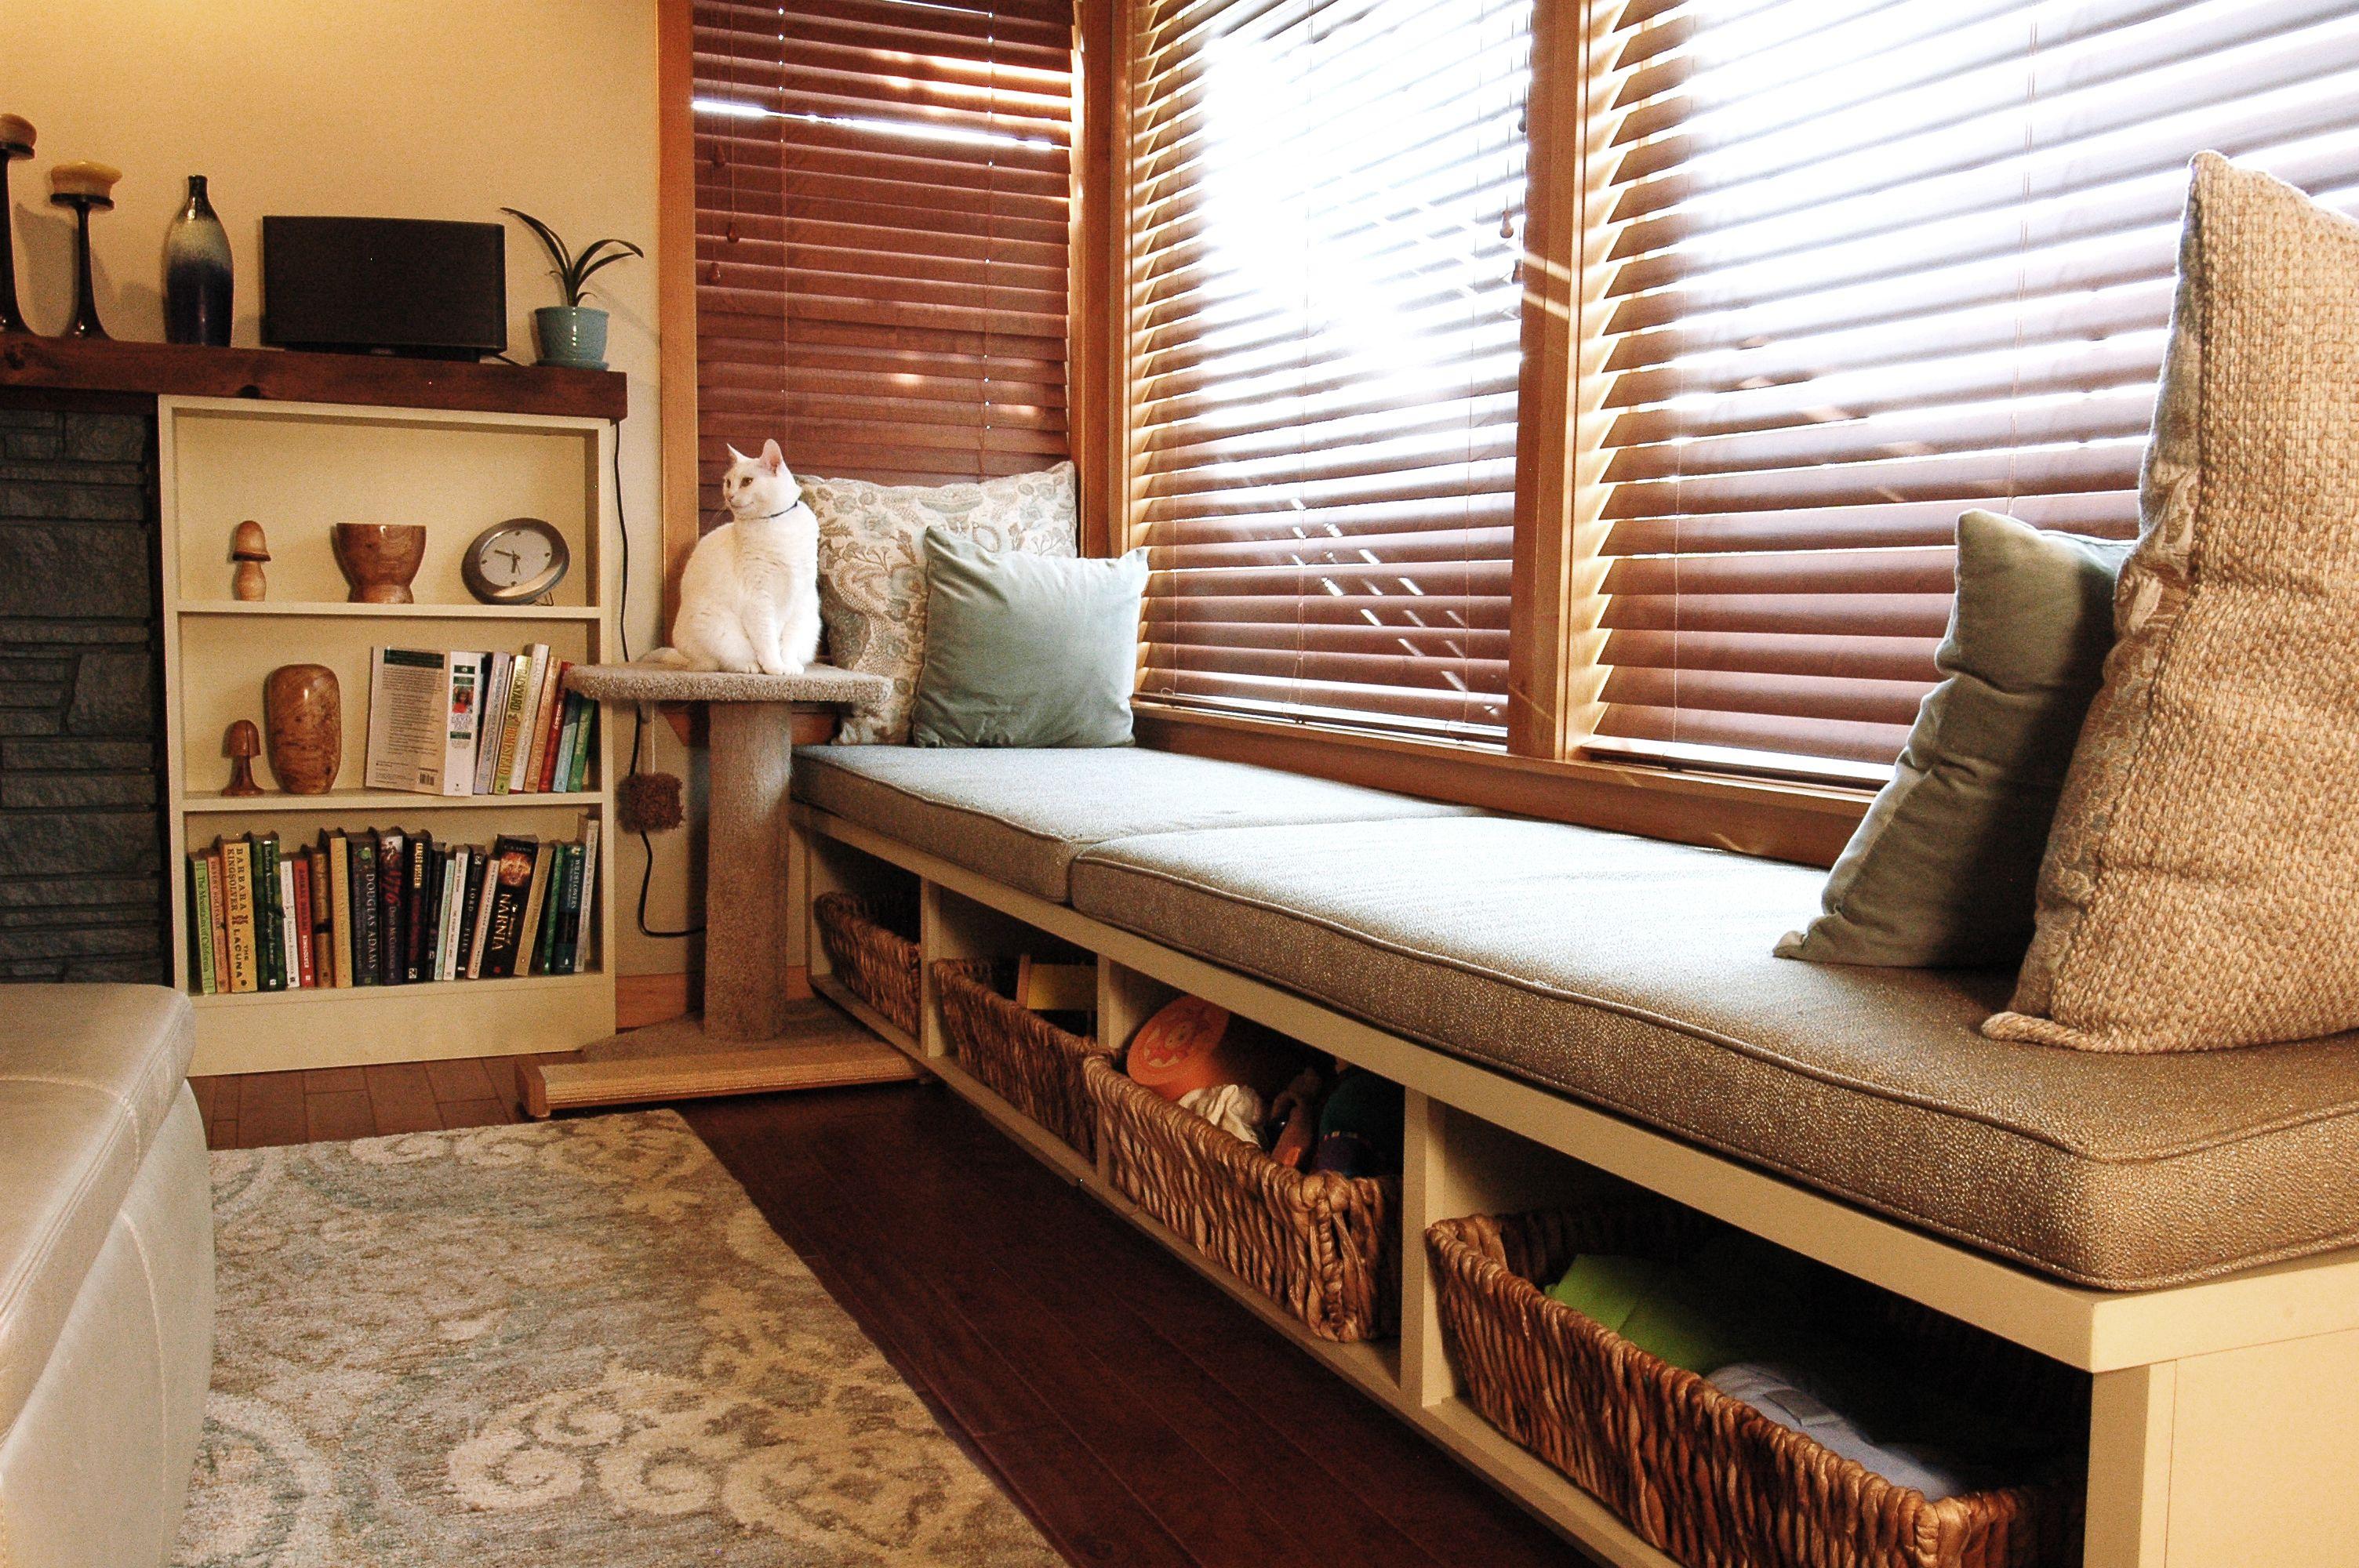 Window seat ideas living room  storage inspiration  using wicker baskets underneath window seating